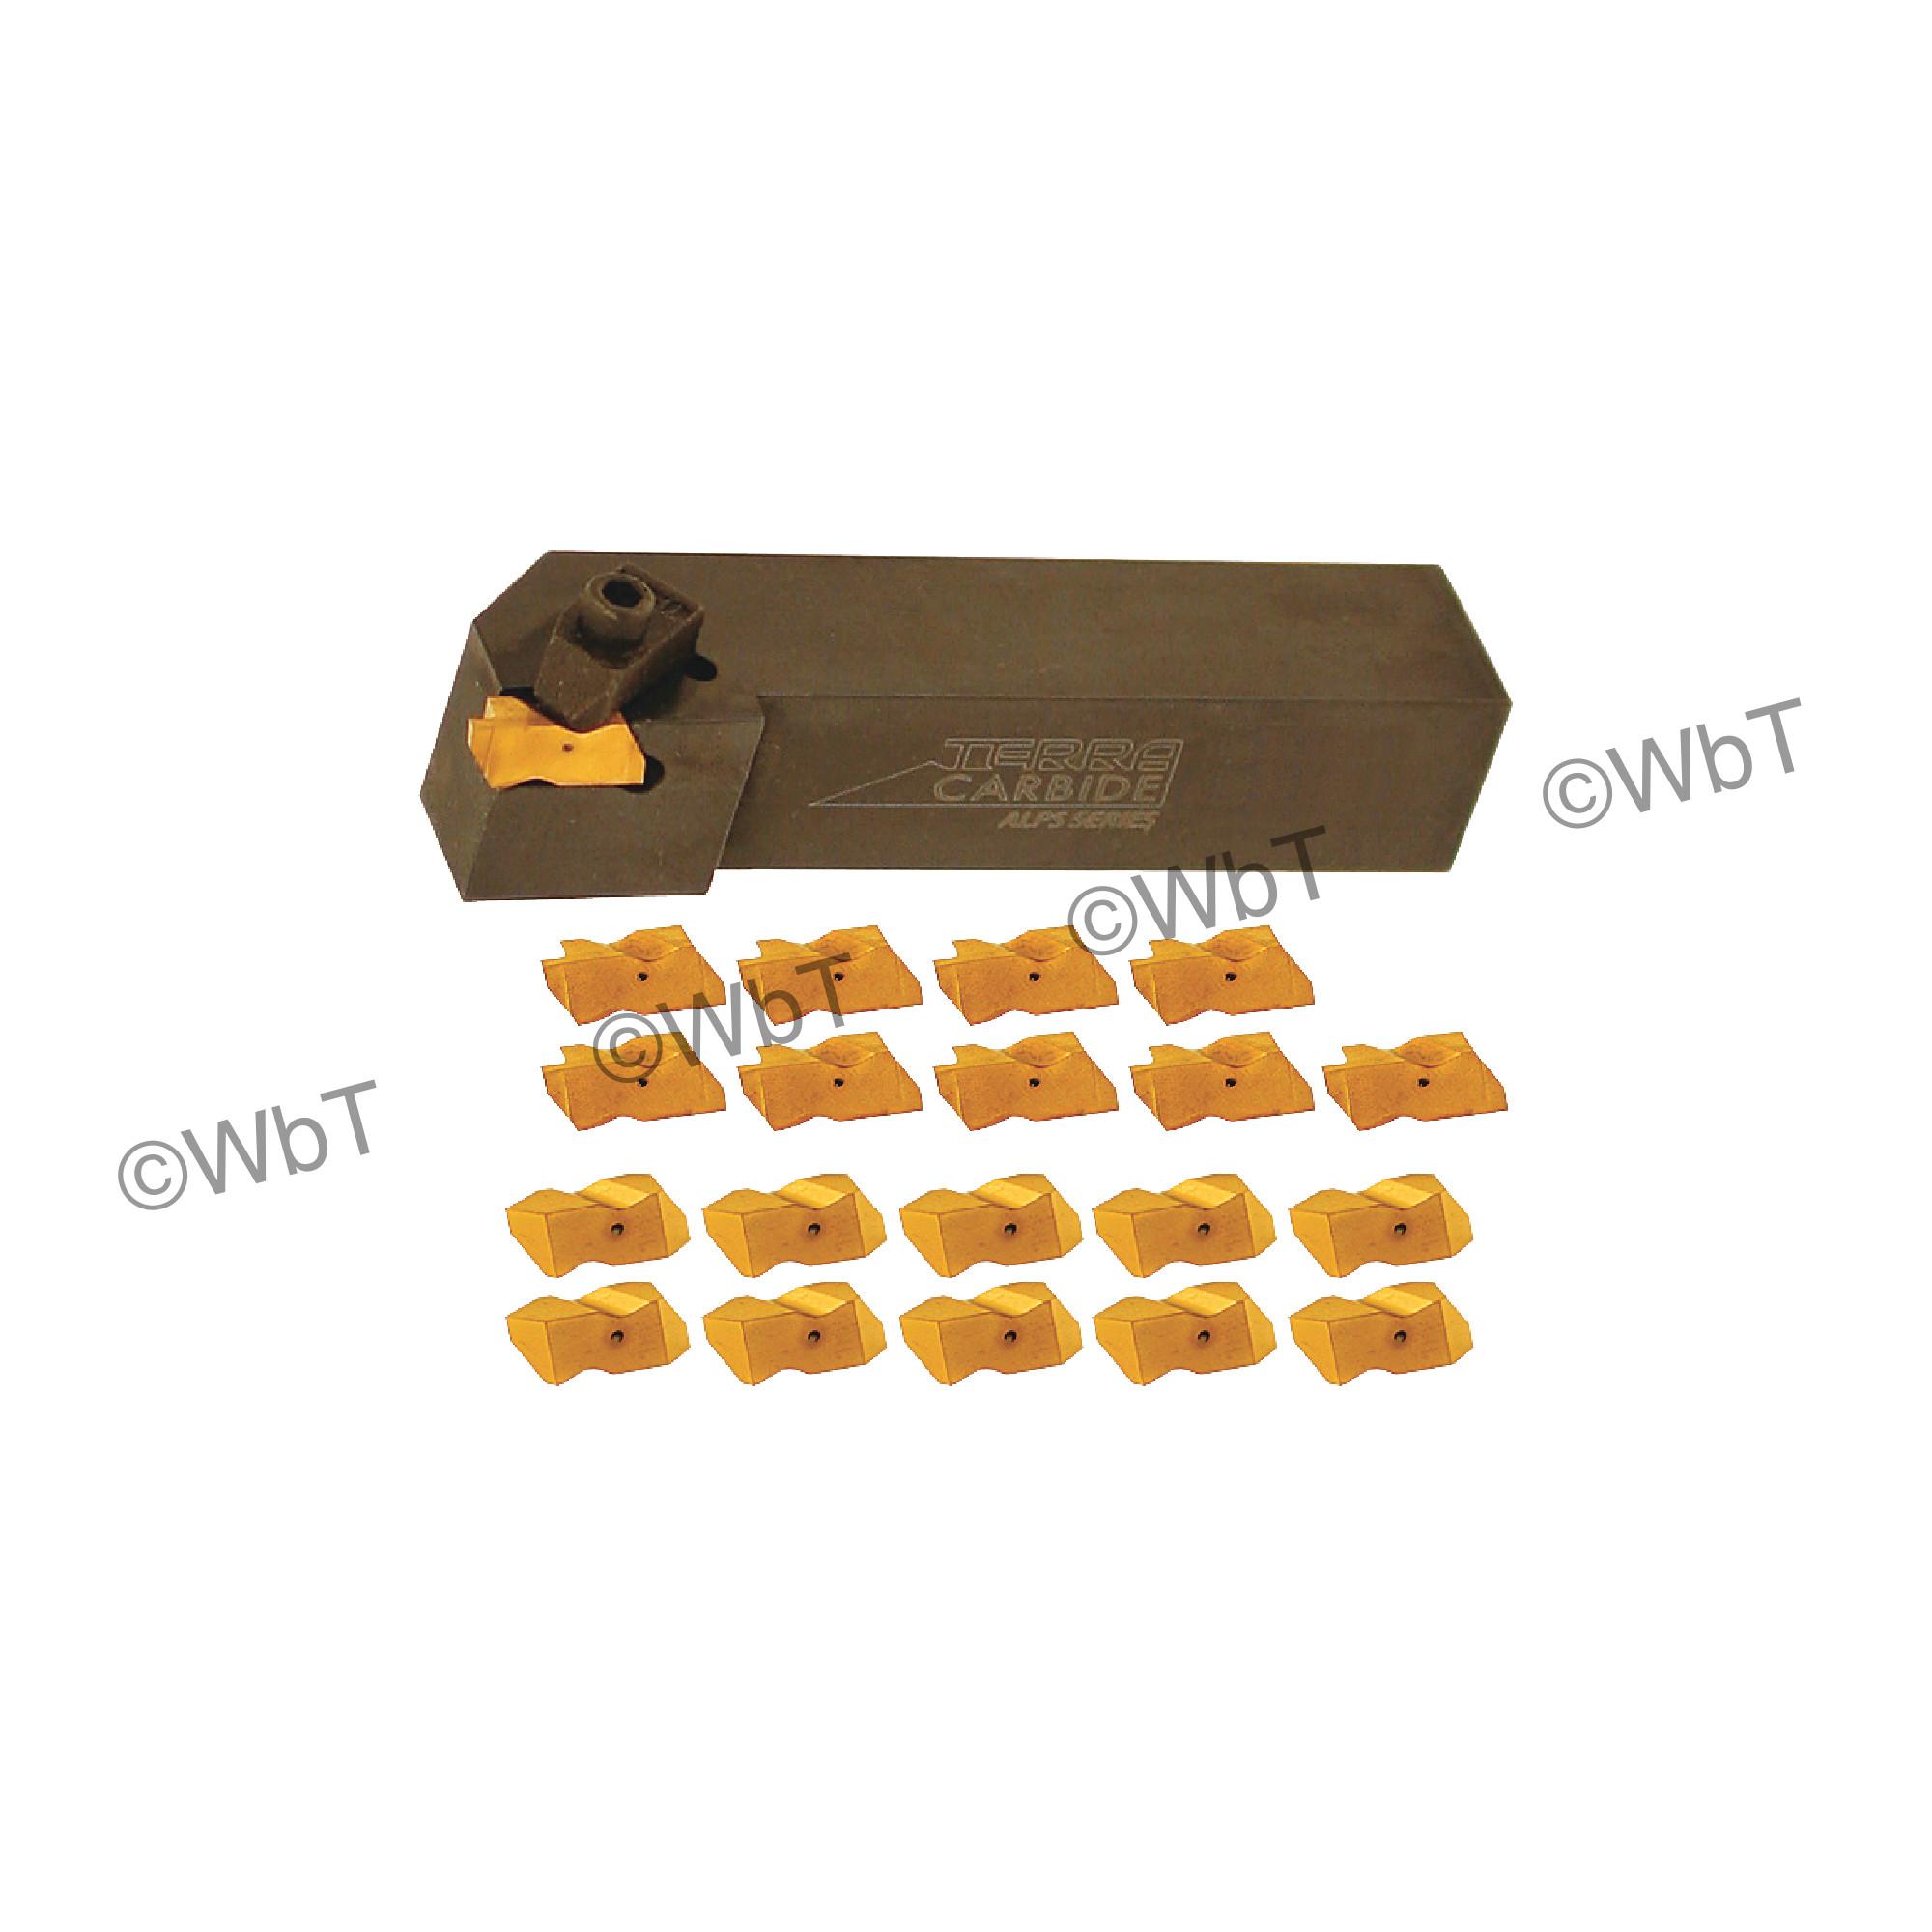 "TERRA CARBIDE - TNSR12-2B / 0.750"" Shank External Holder Sets with (10) TNG 2031R APC5T Inserts & (10) TNT2R APC5T Inser"